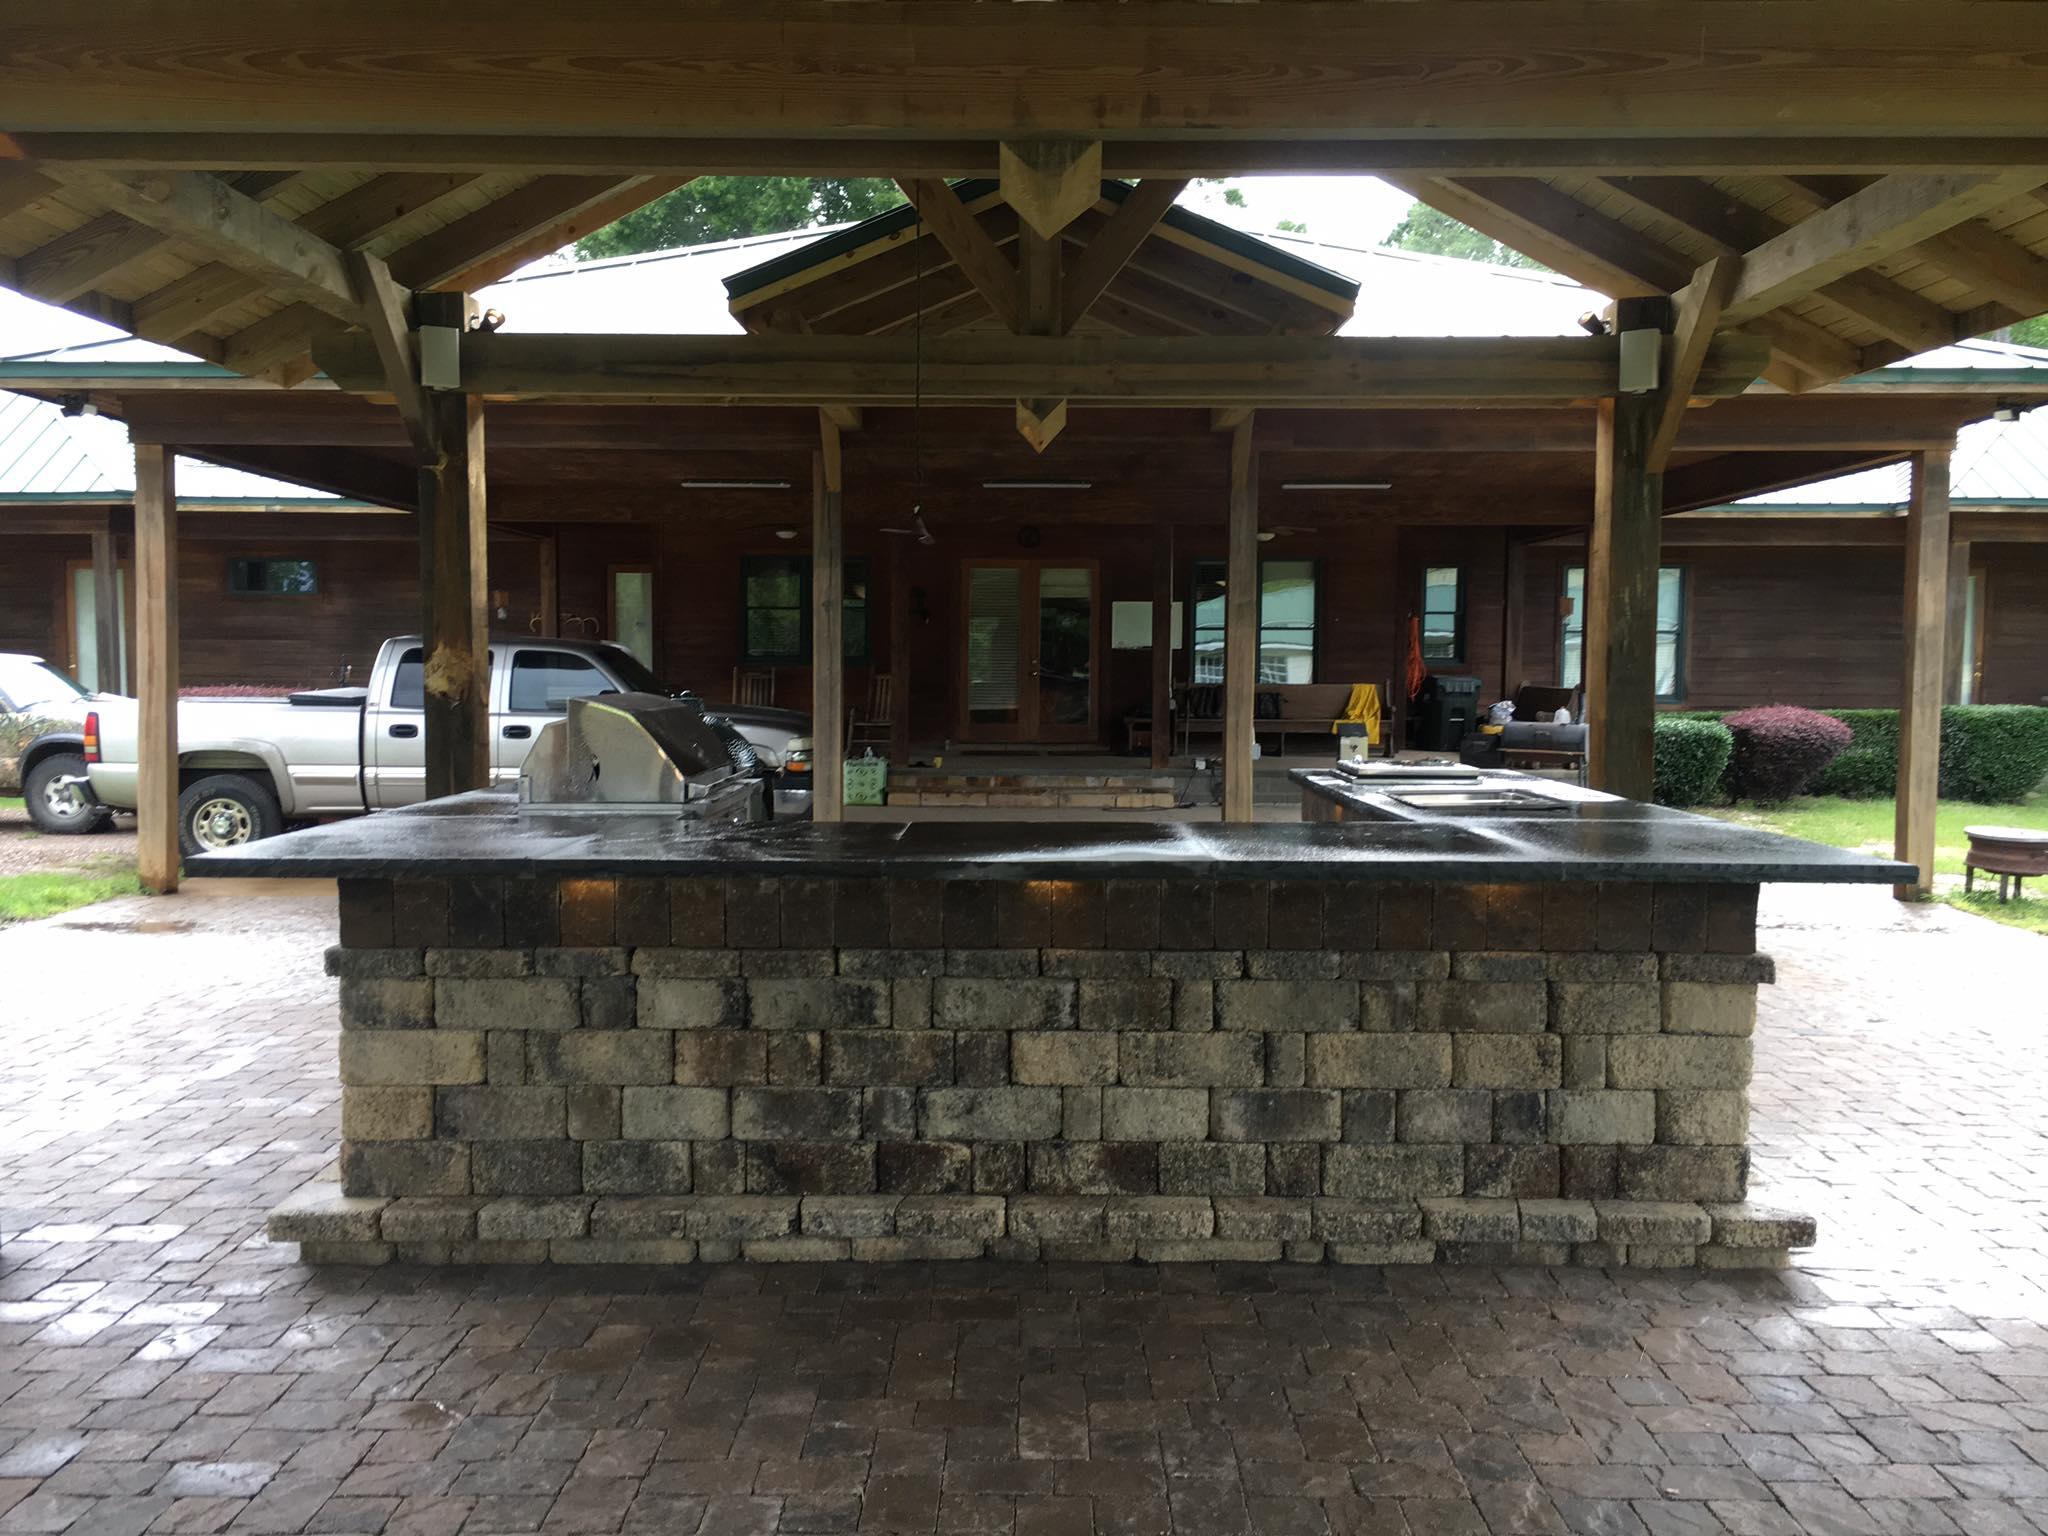 Tremron Stonegate Oak Run outdoor kitchen